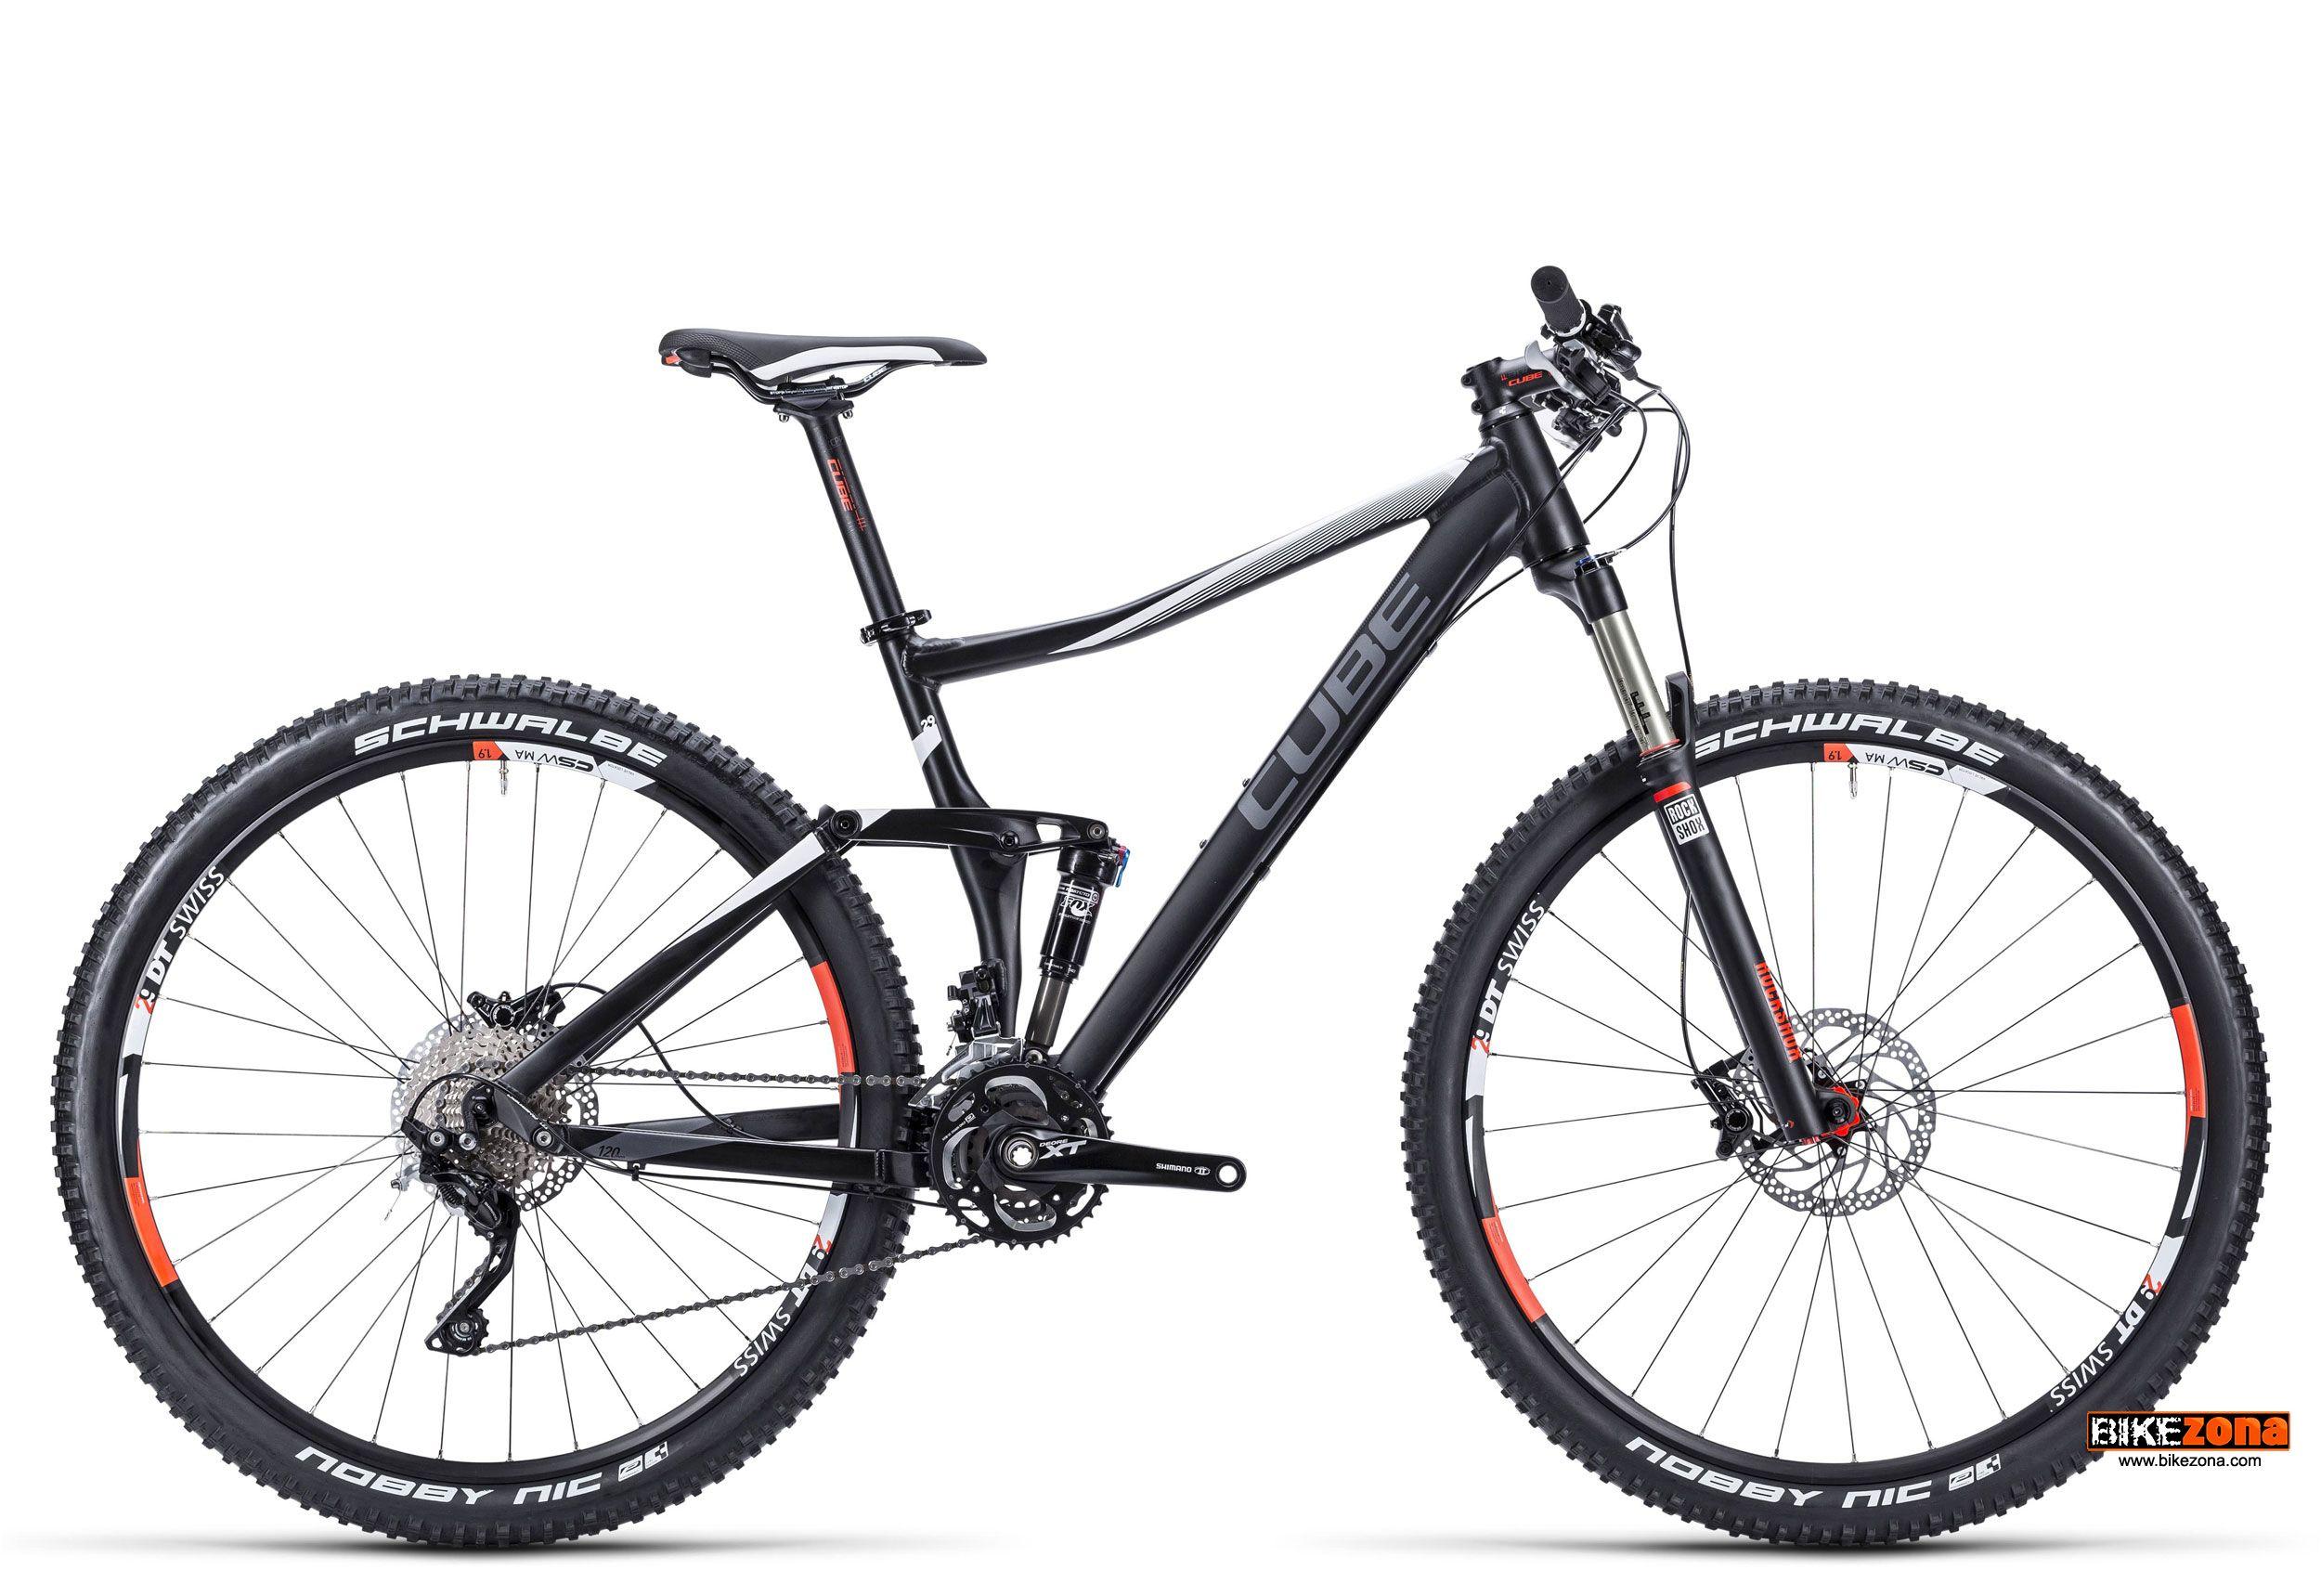 cube stereo 120 hpa pro 29 2015 bicicletas mtb doble xc catal go bicicletas en. Black Bedroom Furniture Sets. Home Design Ideas